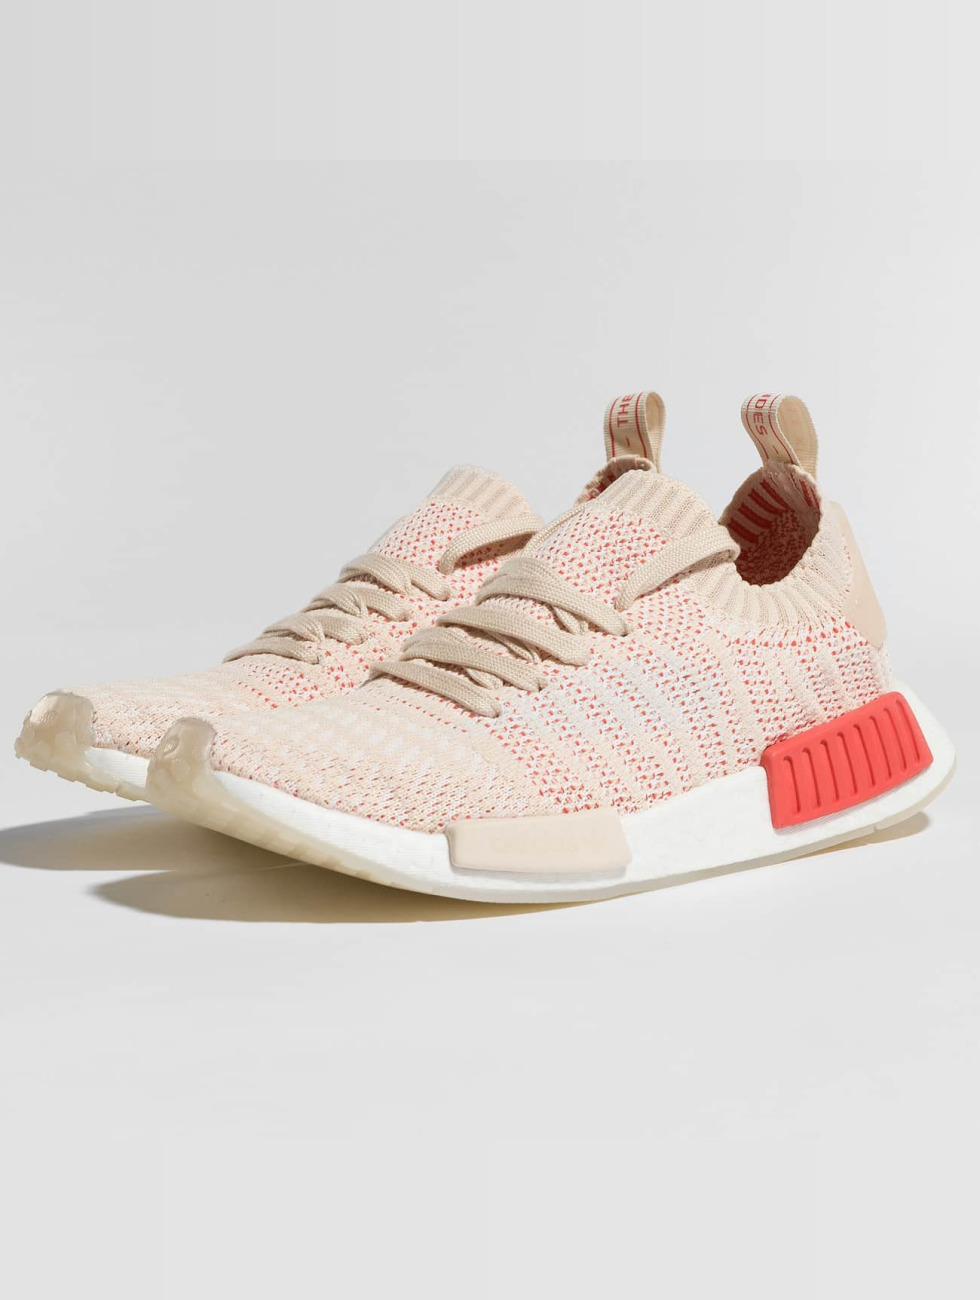 Adidas Originaler Schoen / Joggesko Nmd_r1 Stlt Pk W I Steg 396 123 Billig Pris Uttak 29fmp0yIa7